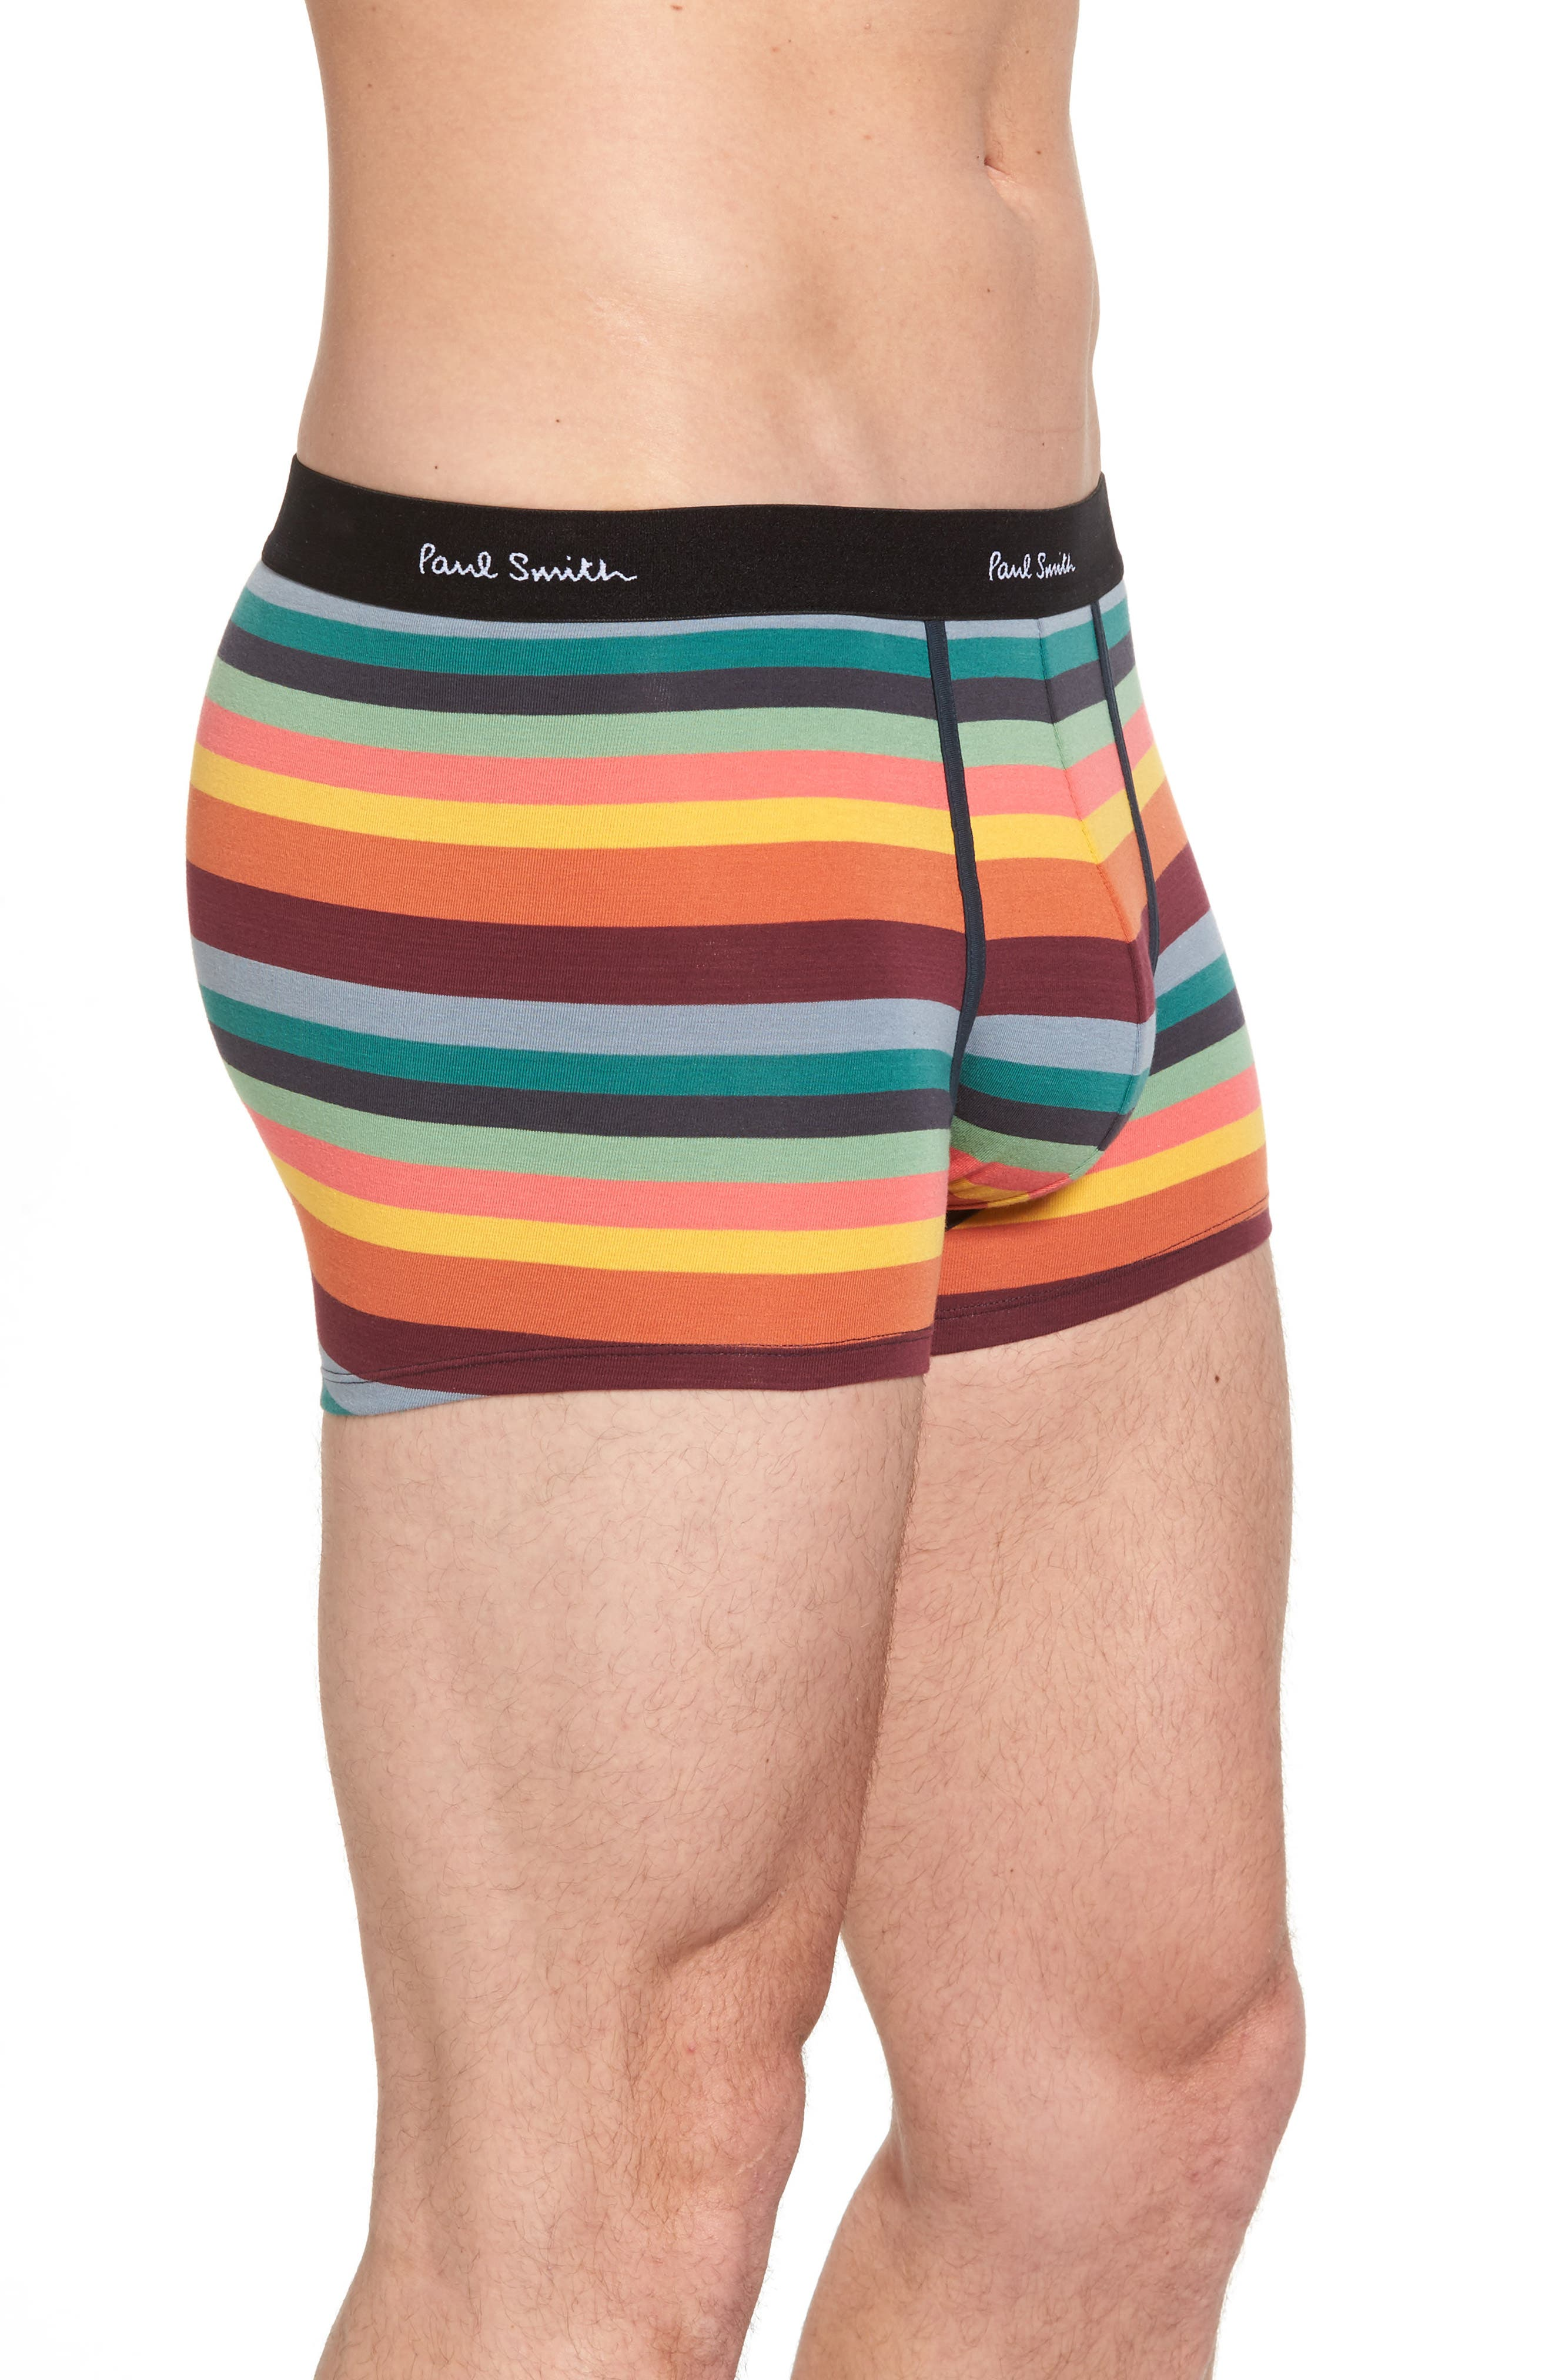 3-Pack Assorted Square Cut Trunks,                             Alternate thumbnail 4, color,                             Black/ Multi Stripe